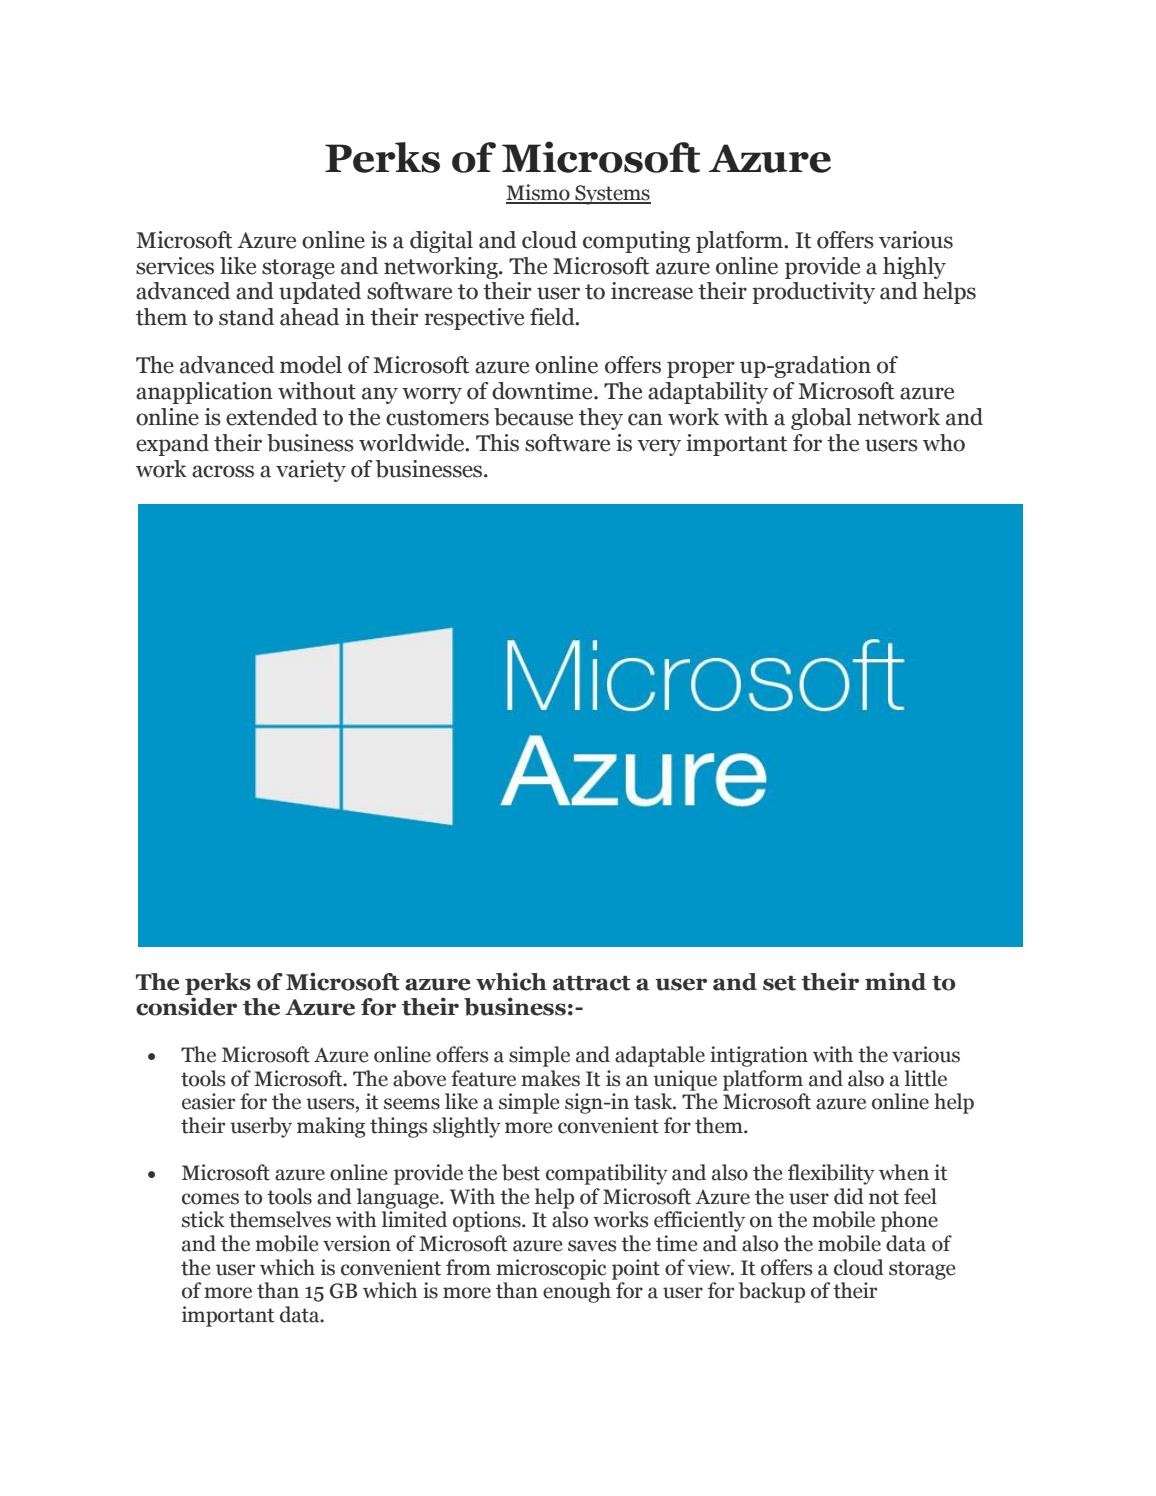 Microsoft azure cloud computing platform services - Microsoft Azure Cloud Computing Platform Services 12